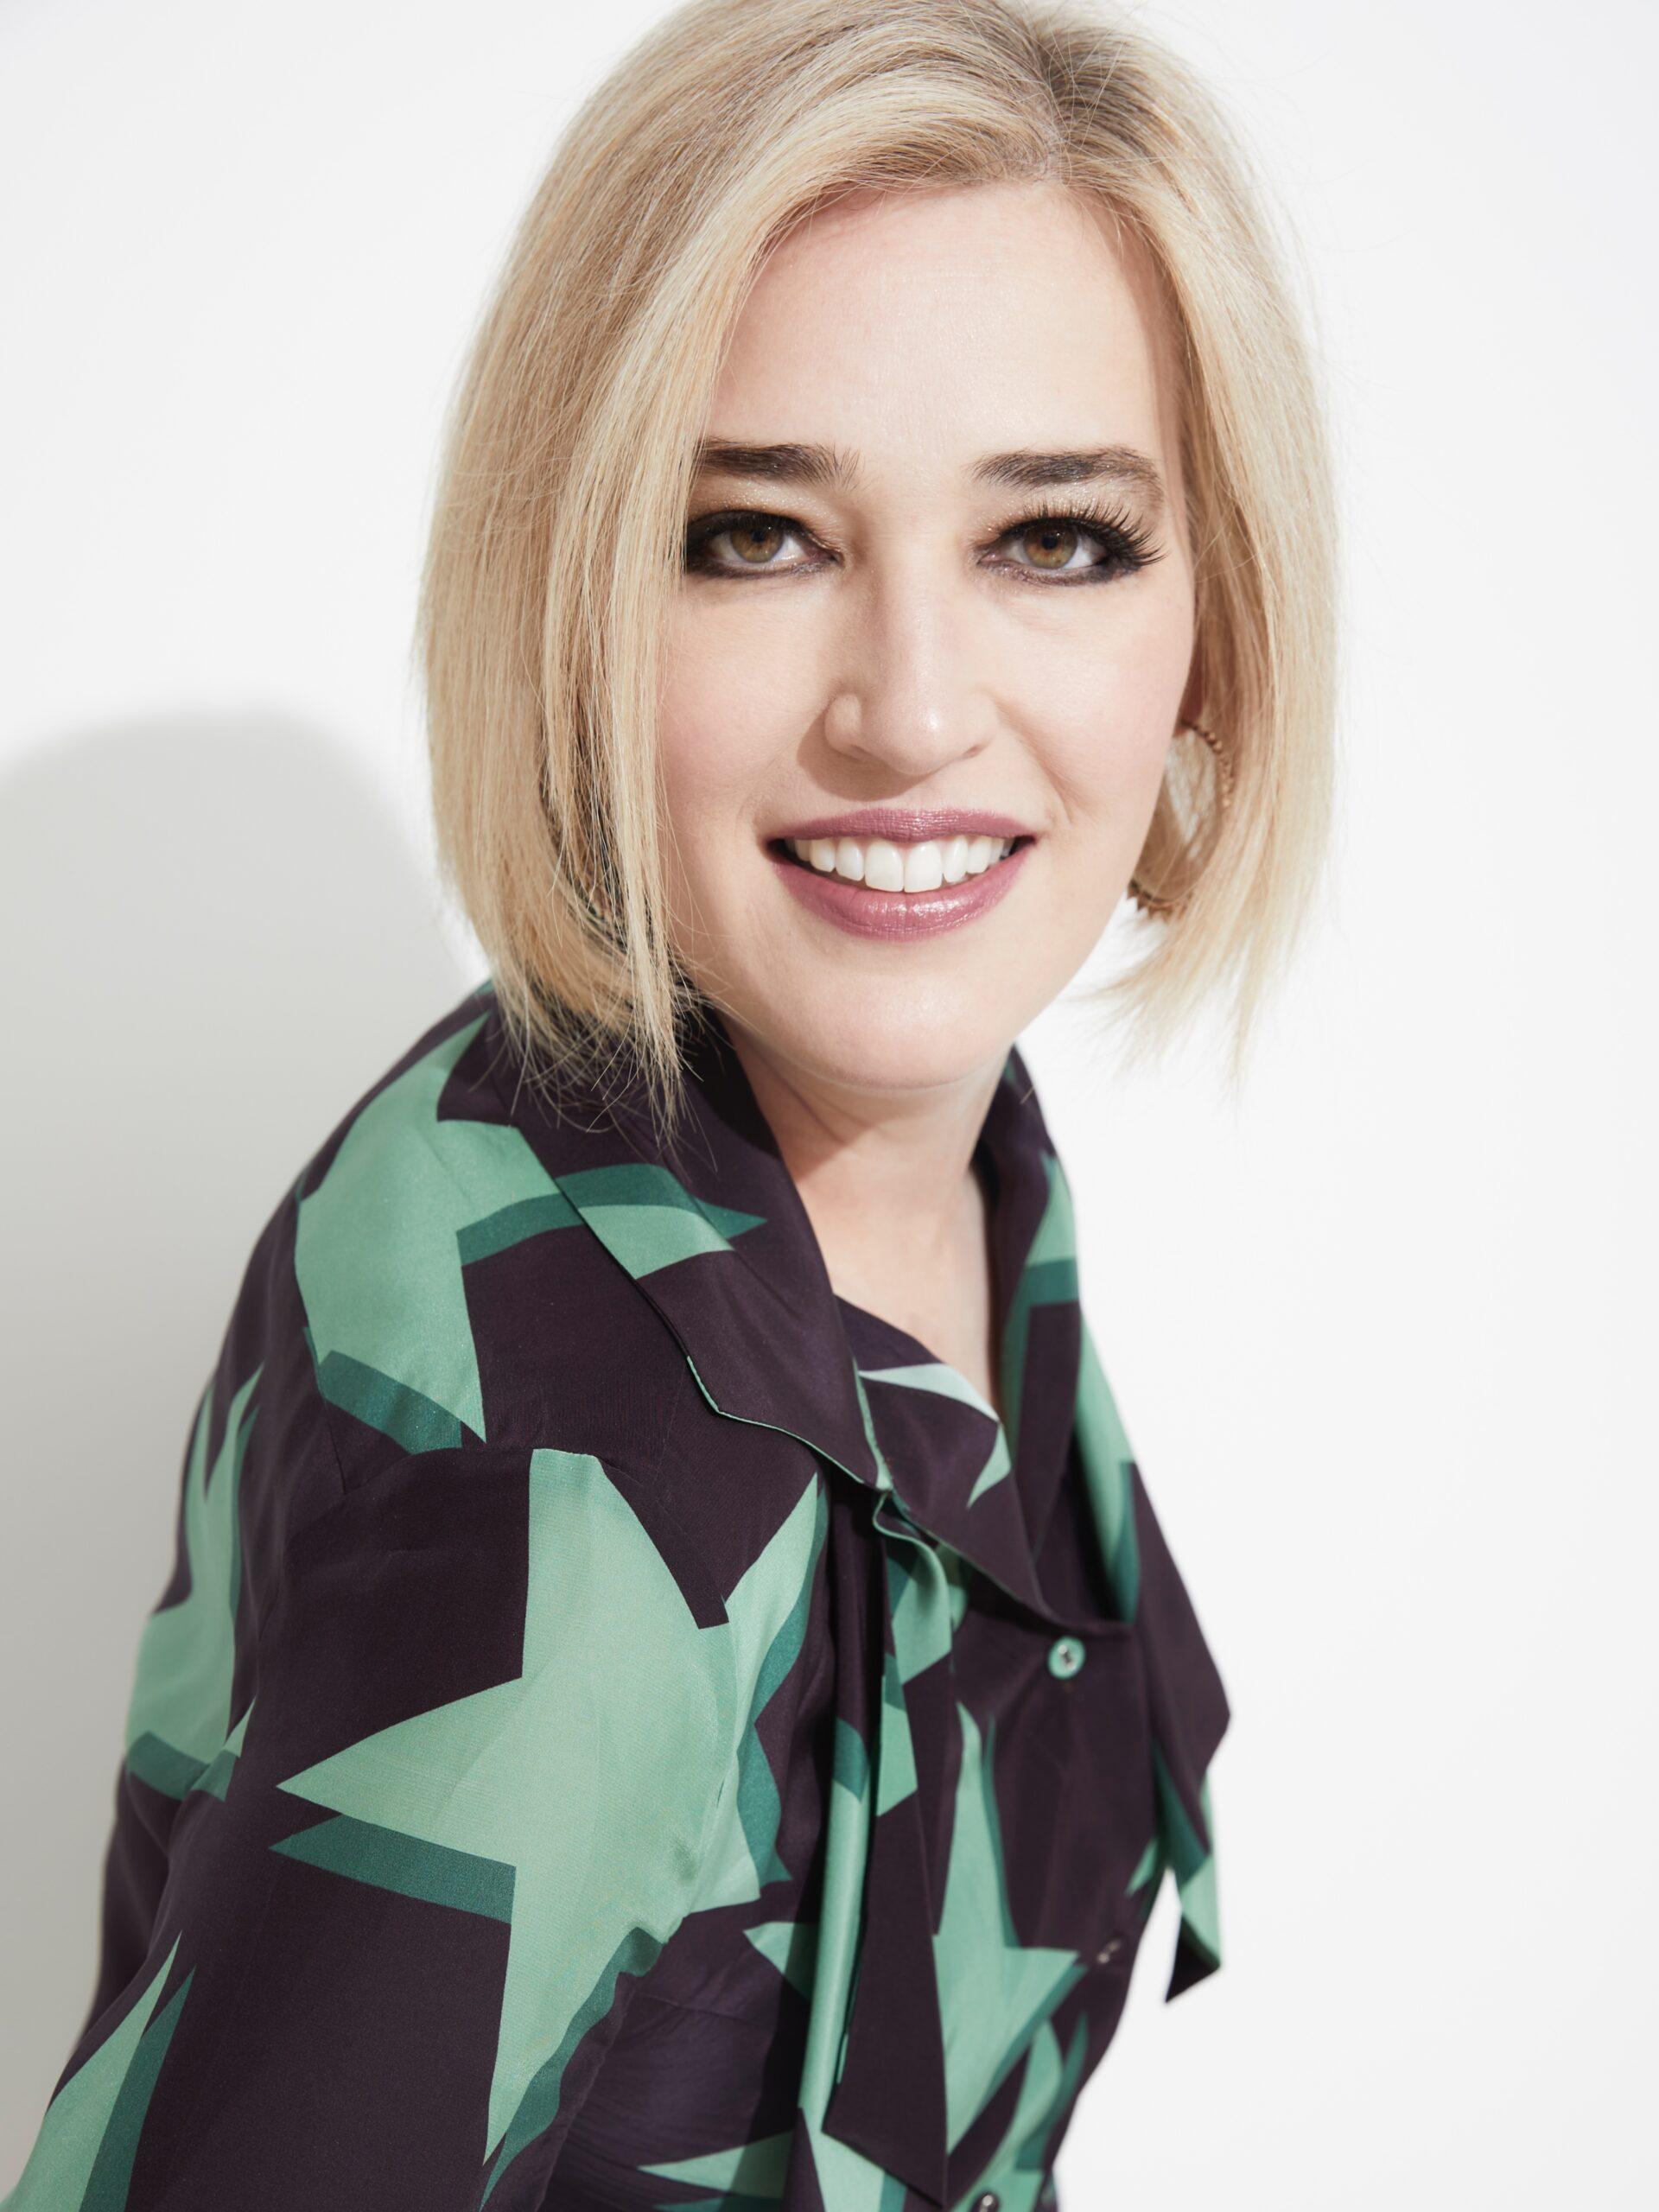 Natalie Gurley